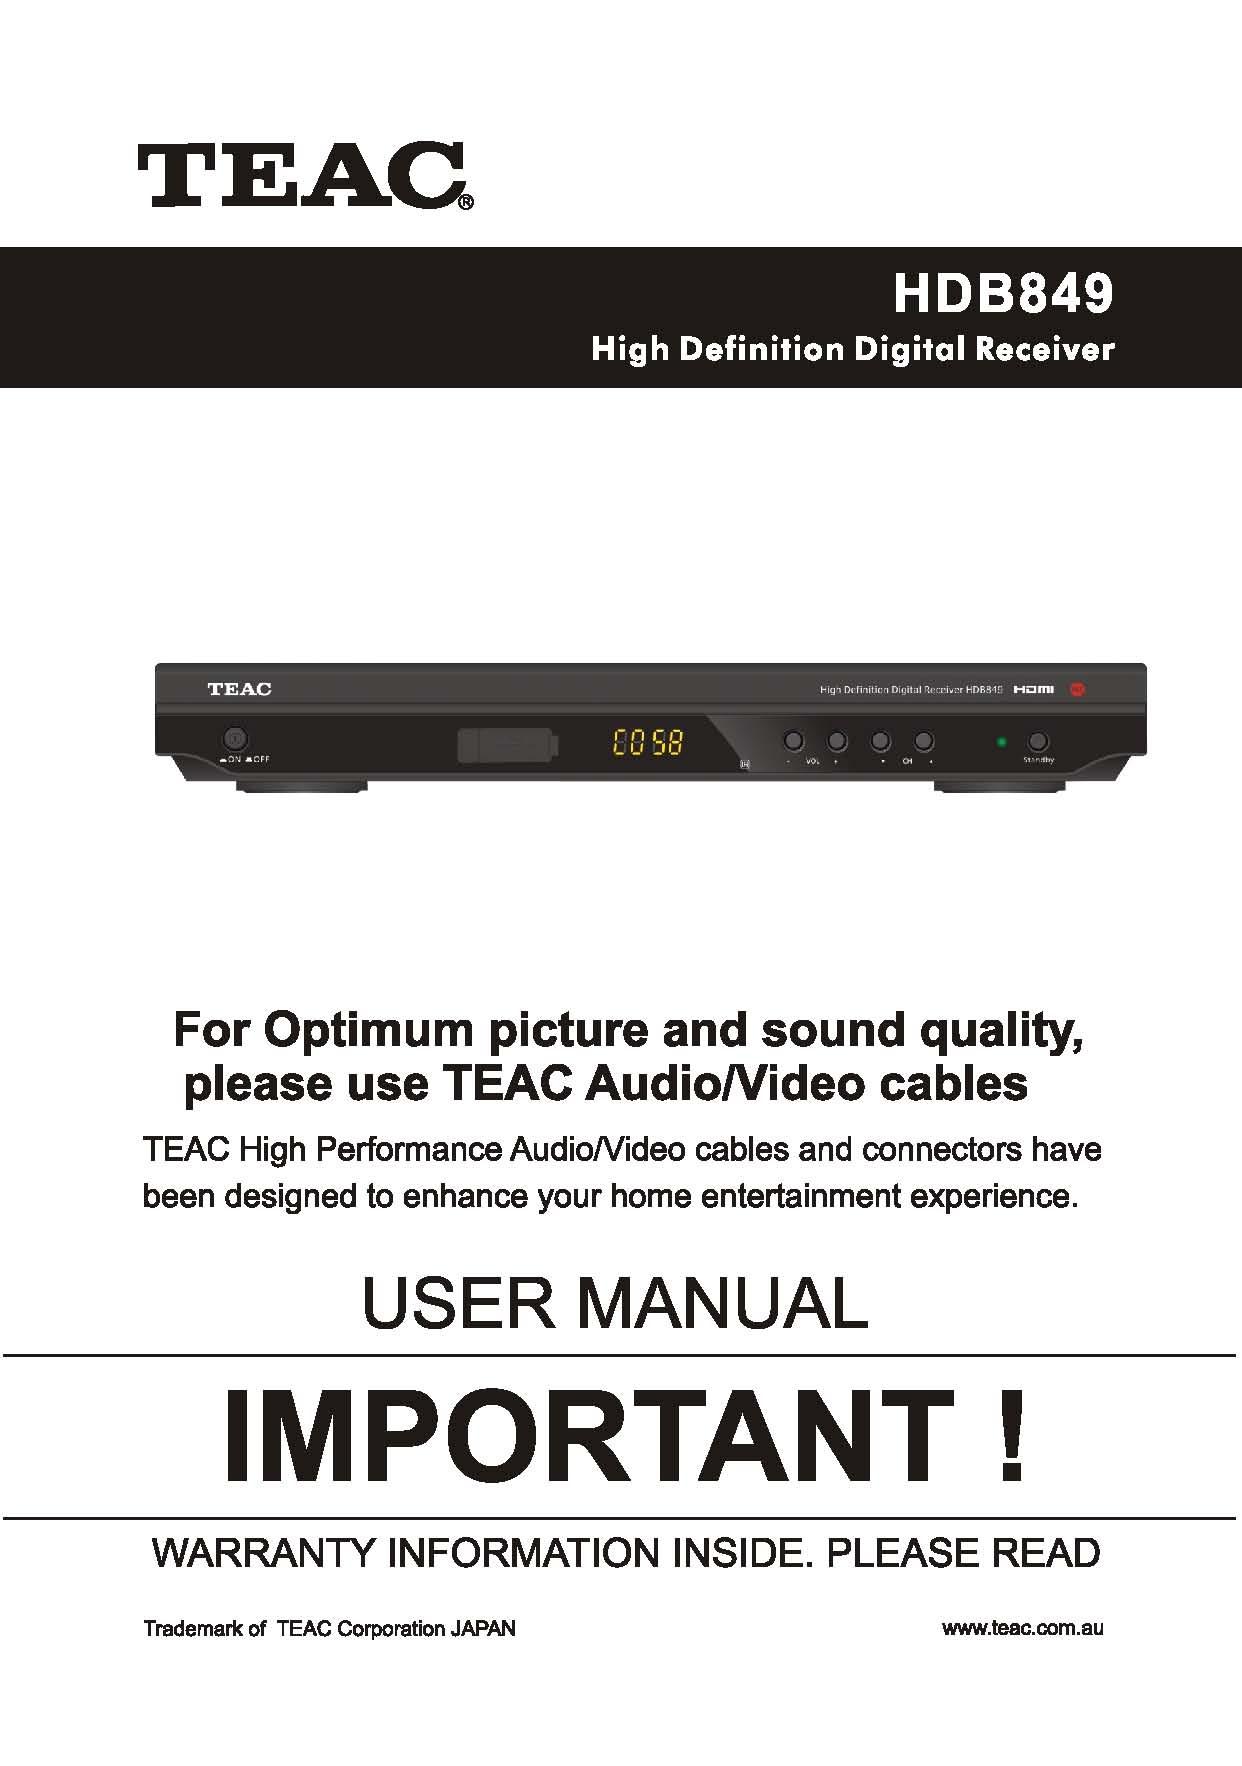 teac hdb849 user manual ...